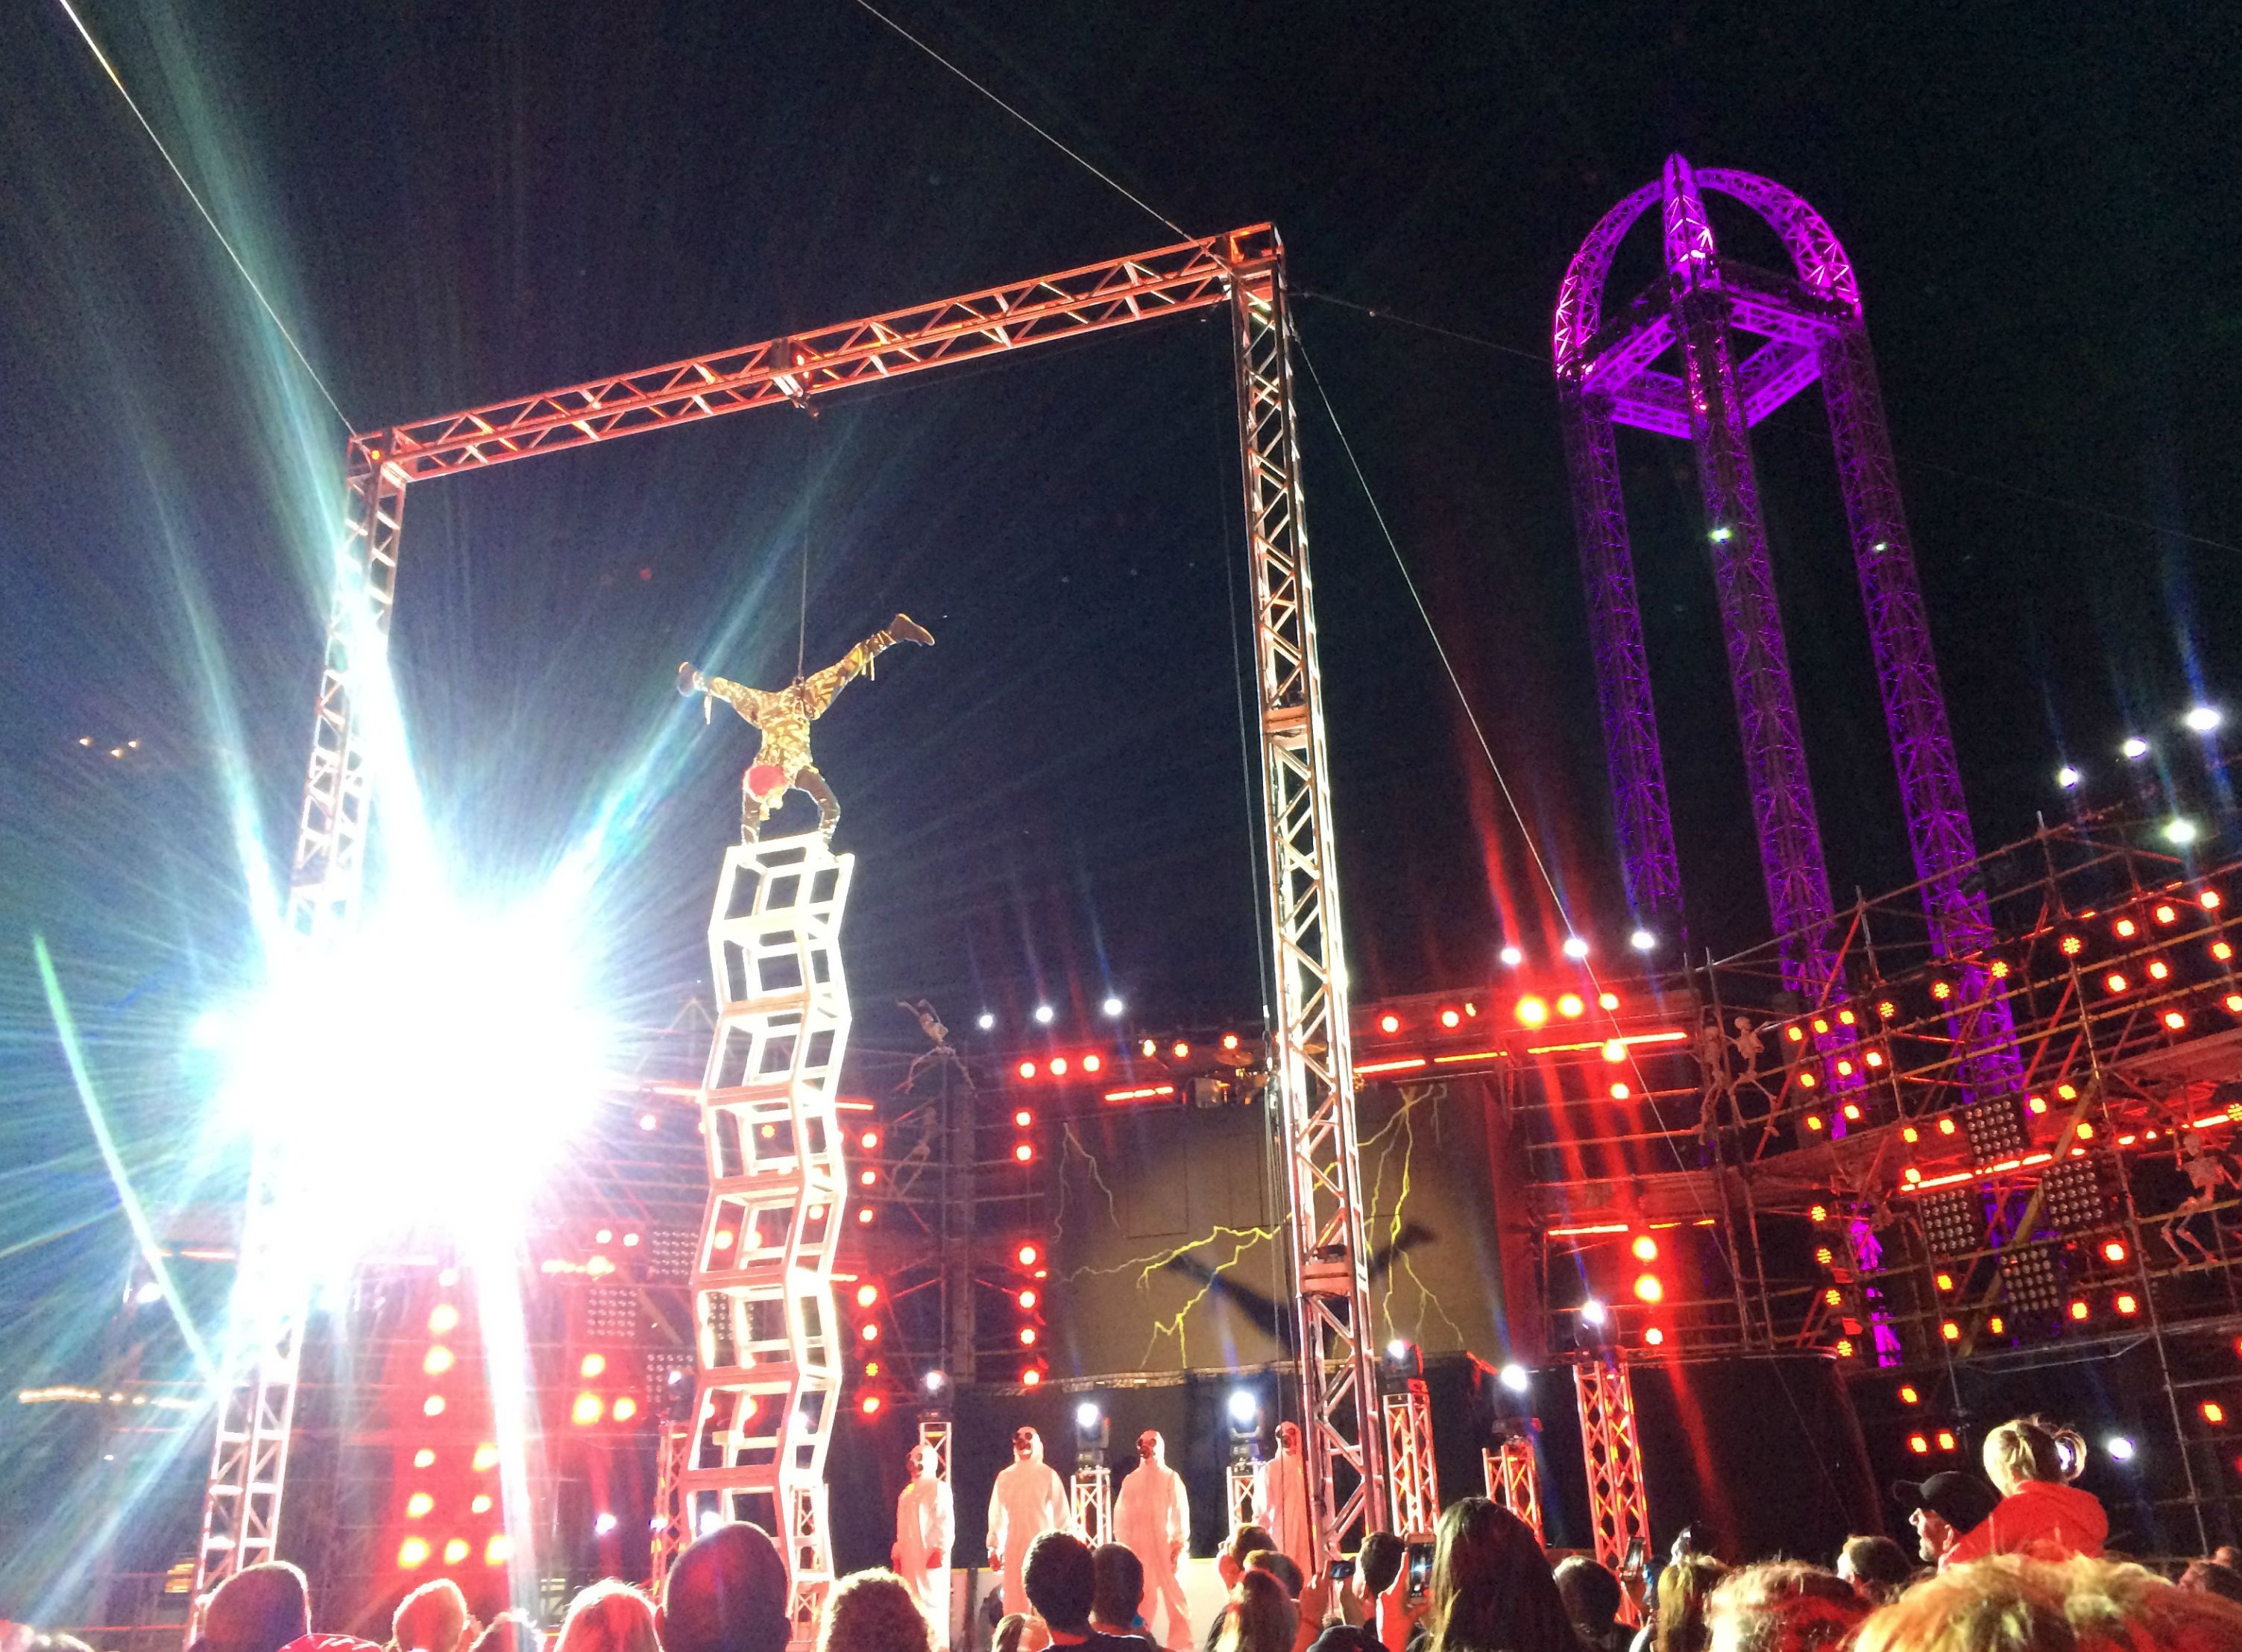 Cedar Point HalloWeekends stage show